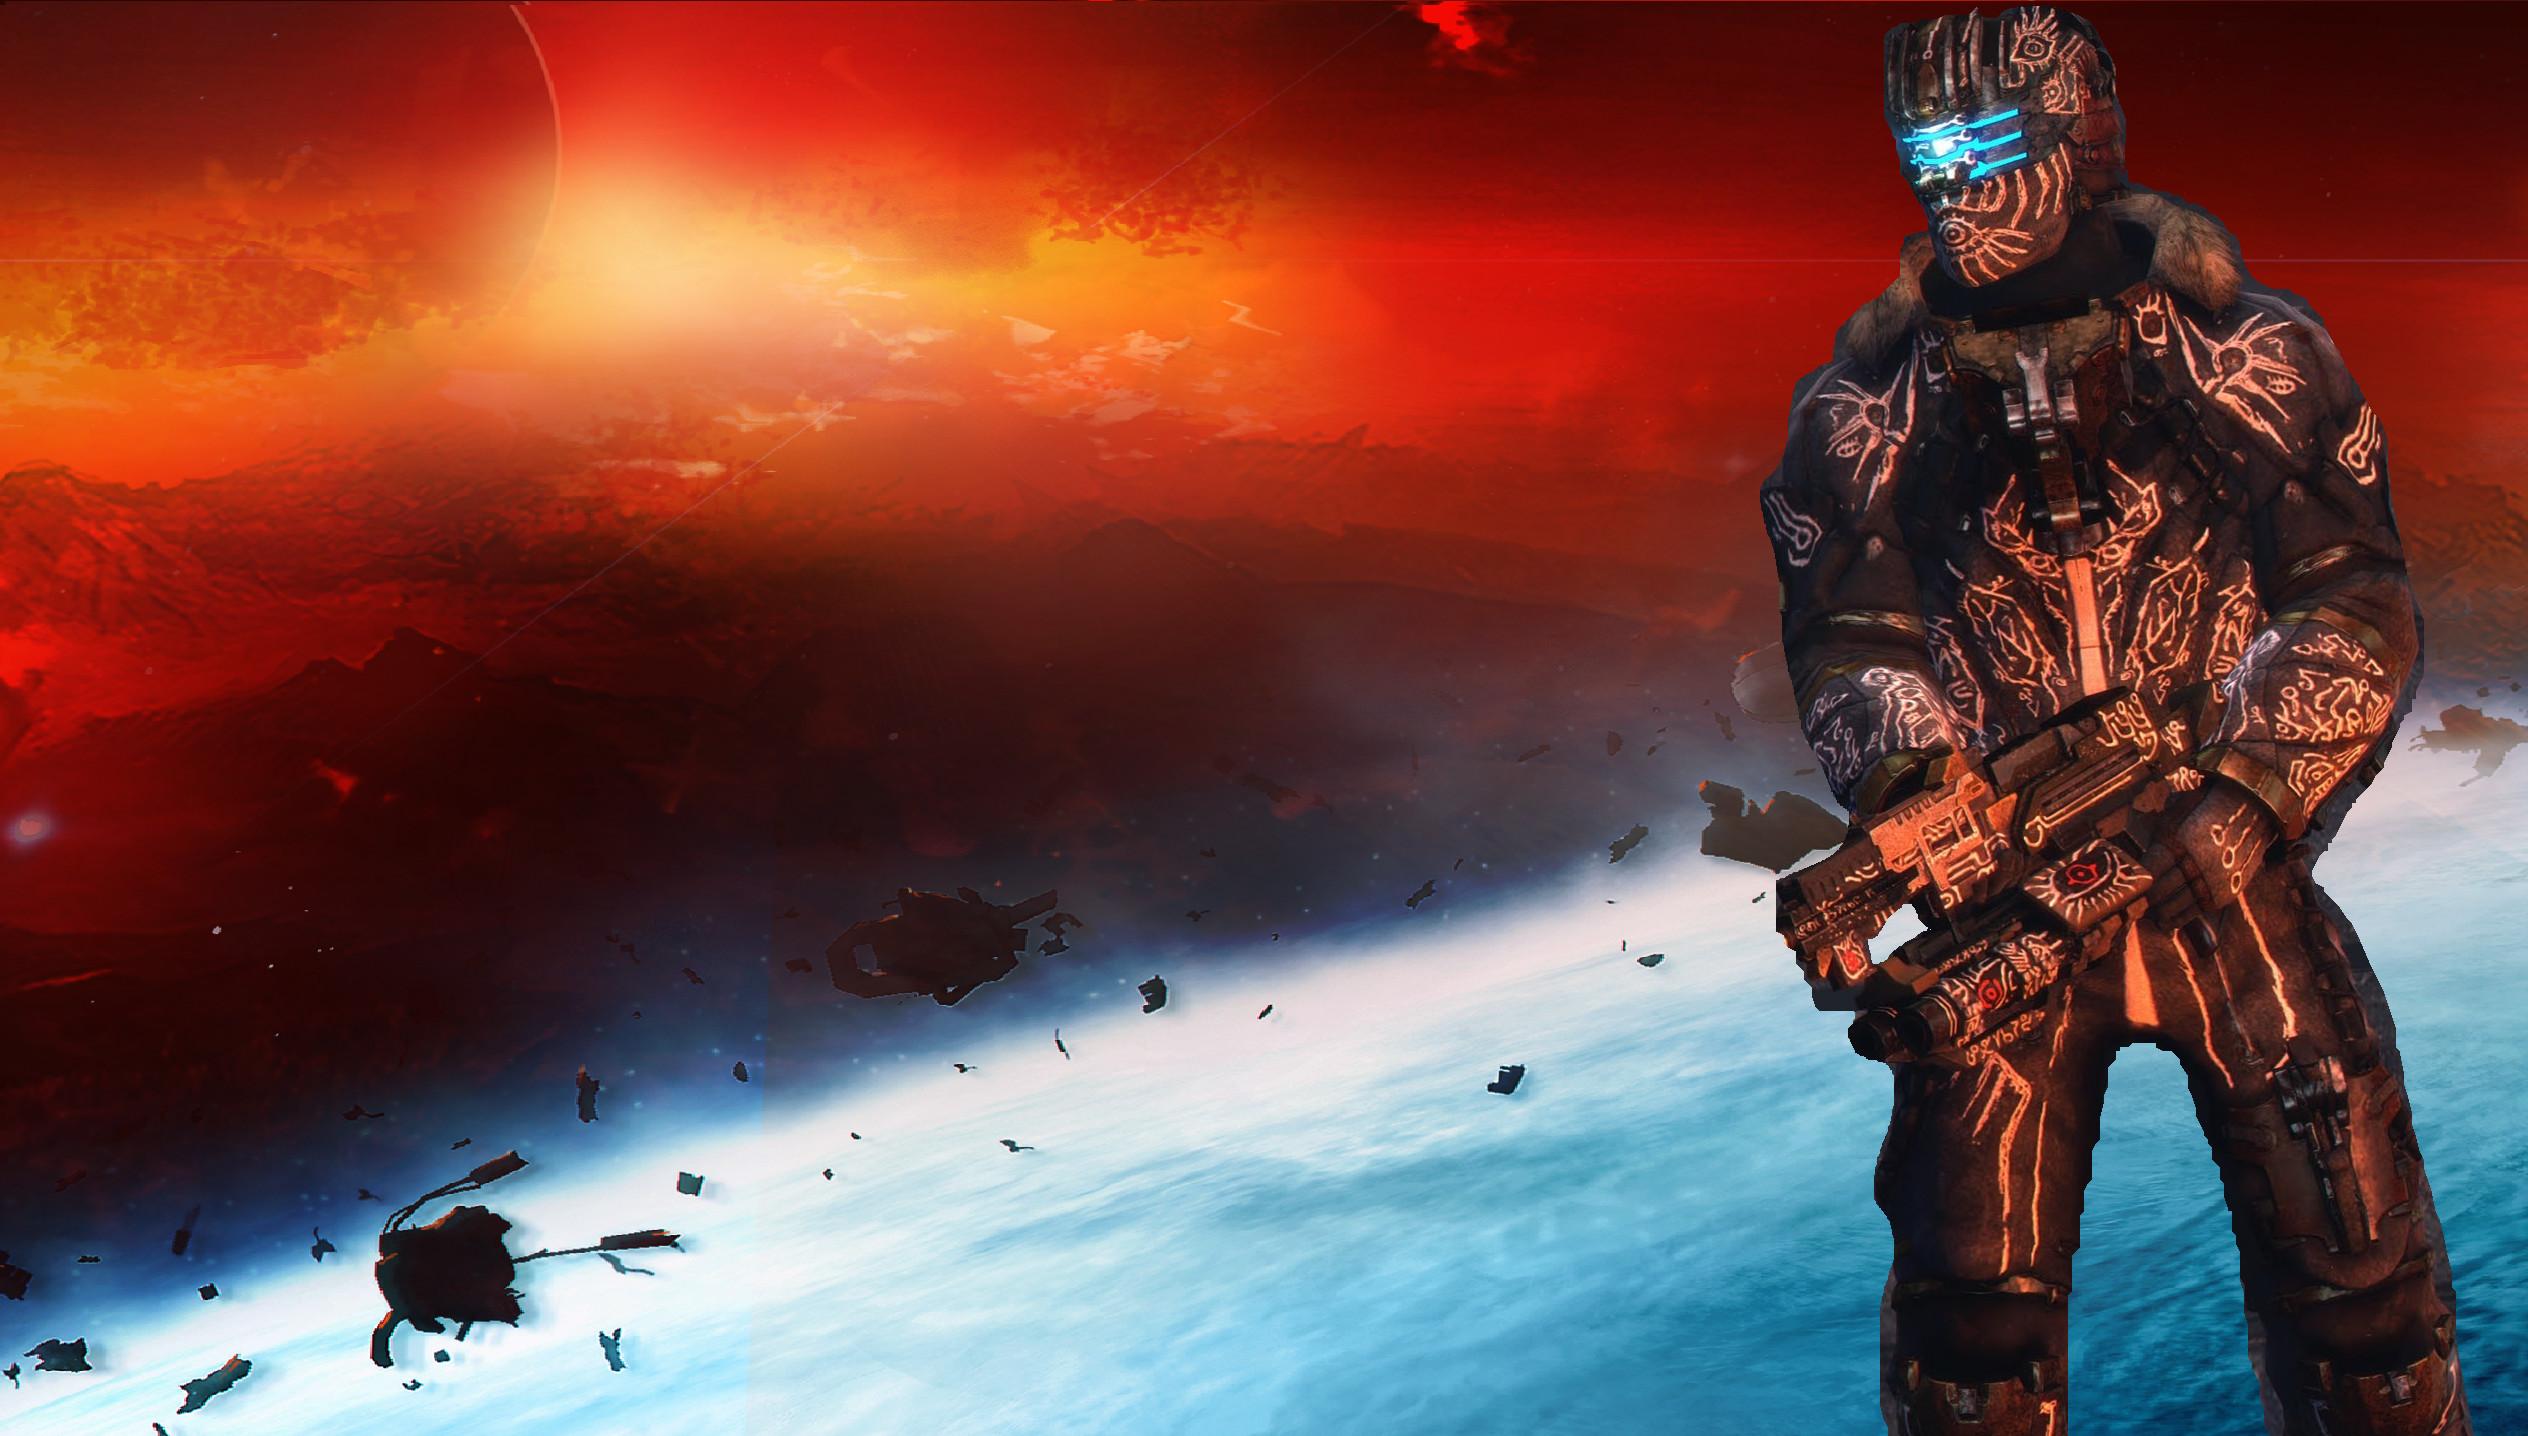 Res: 2528x1436, Dead Space 3 Suits N7